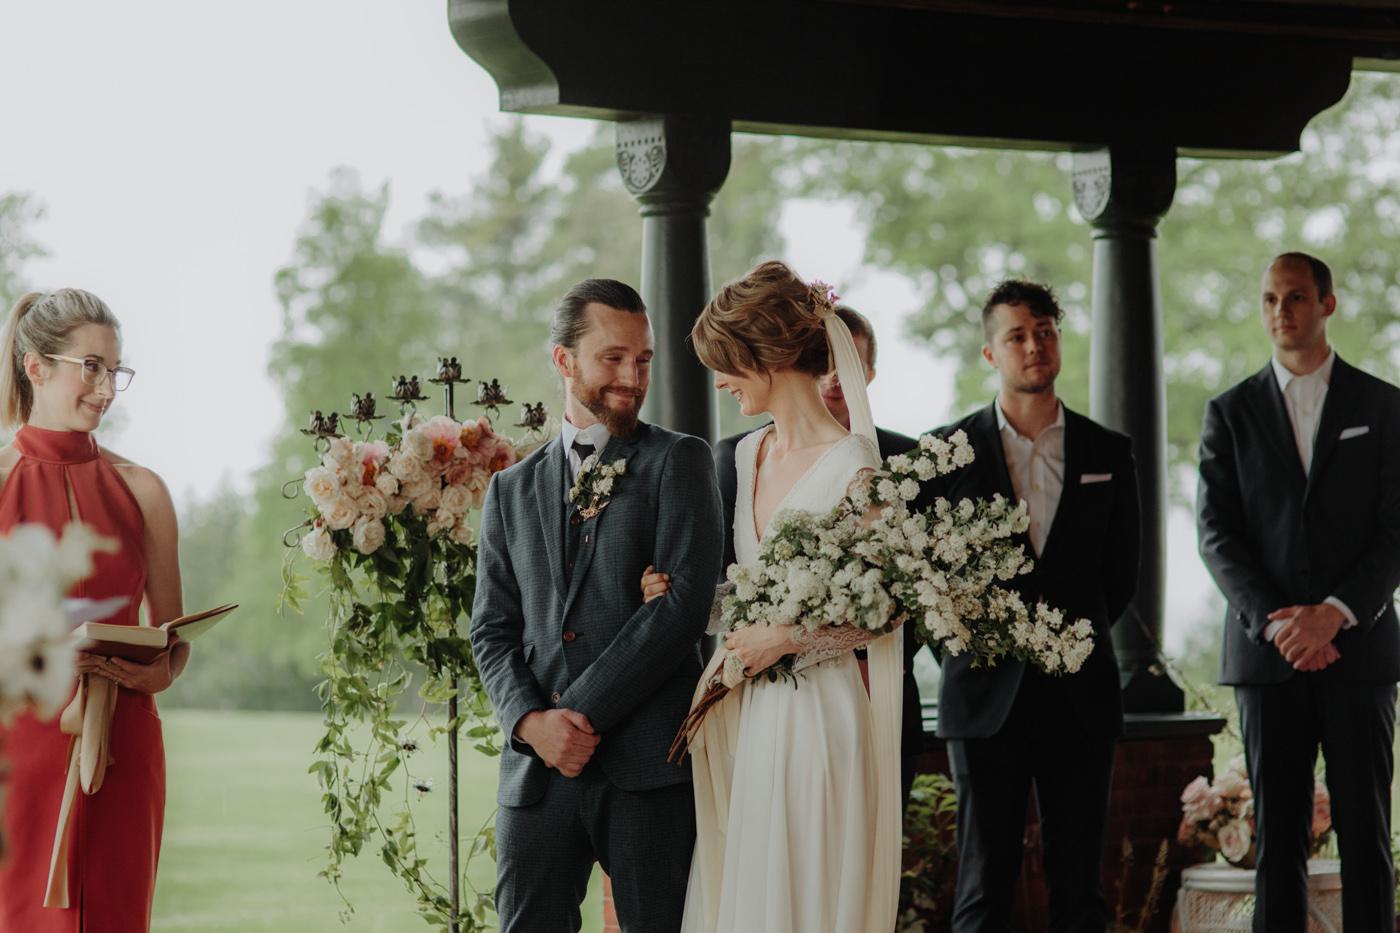 Erin-Mike-Intimate-Vintage-Wedding-Shelburne-Farms-Vermont -83.jpg